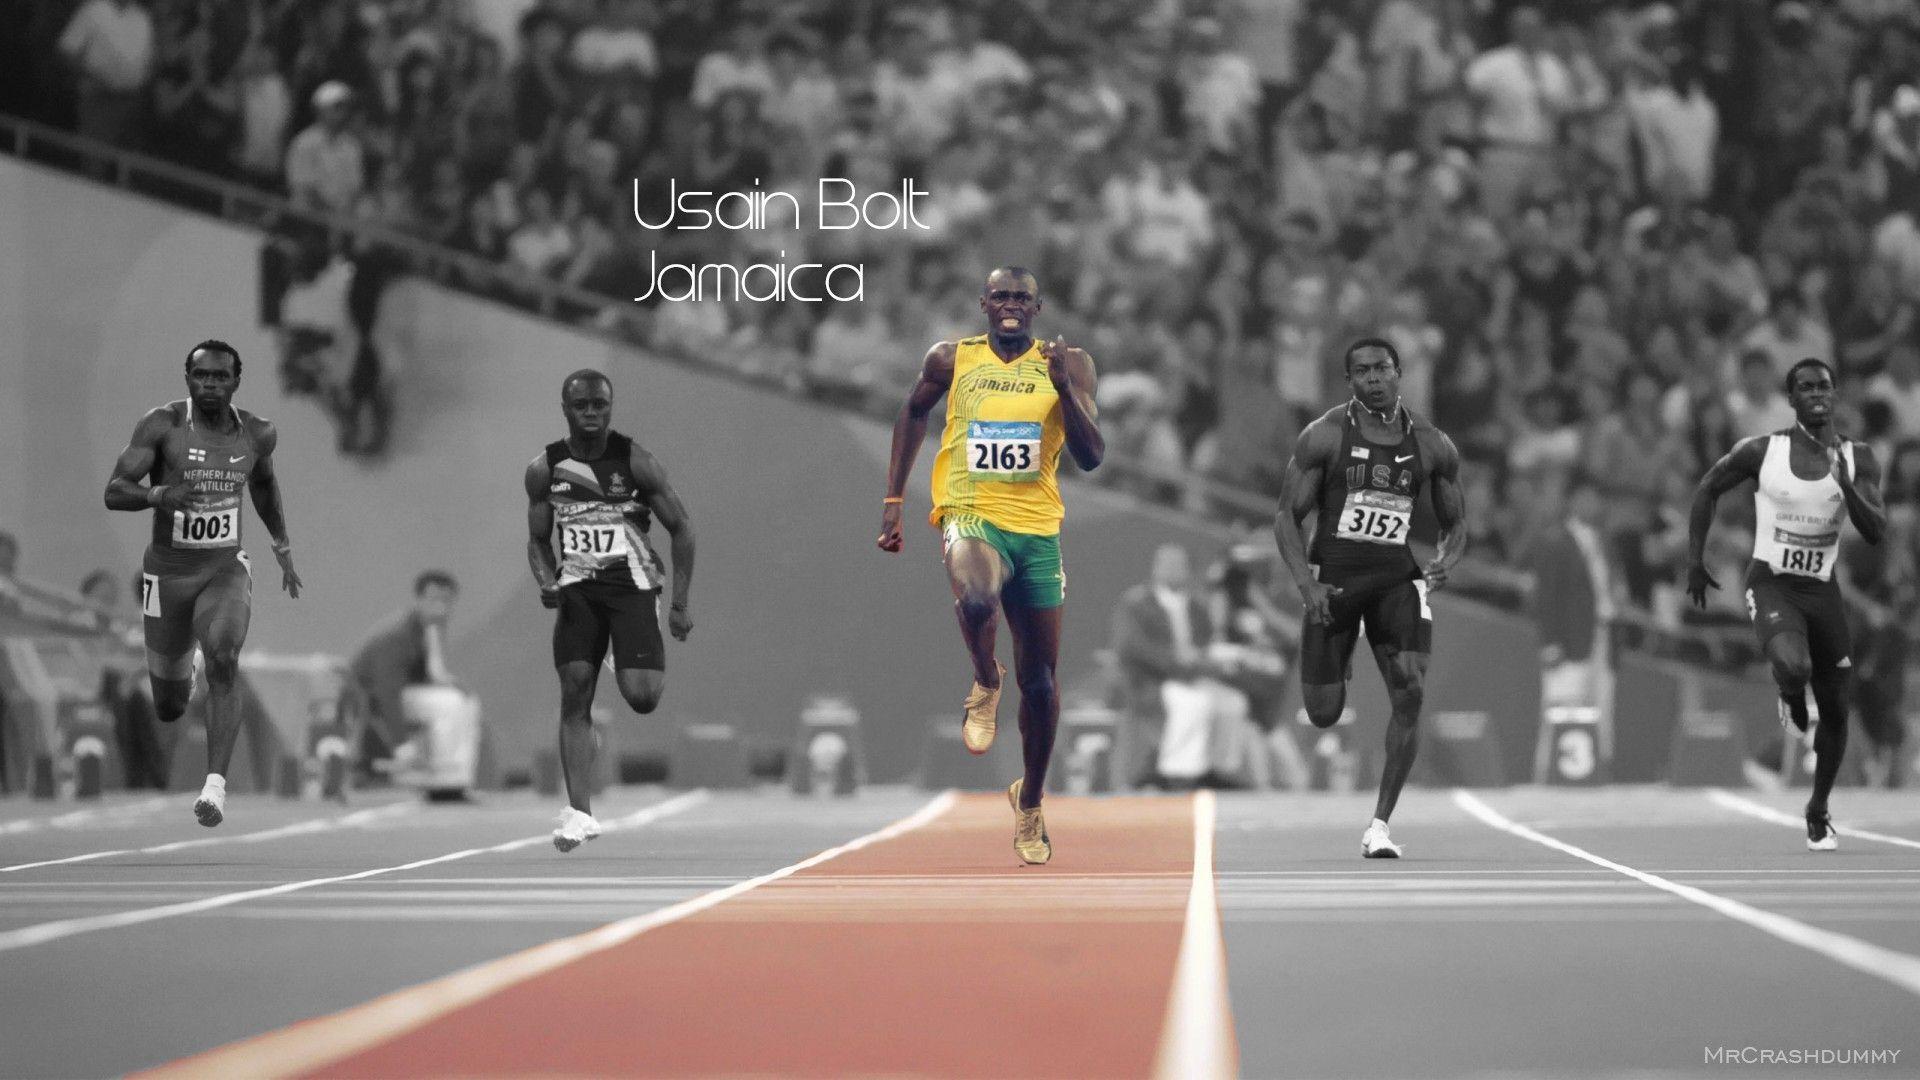 1920x1080 Usain Bolt Run Sprint Olympics Colorsplash Hd Wallpaper Usain Bolt Usain Bolt Running Usian Bolt